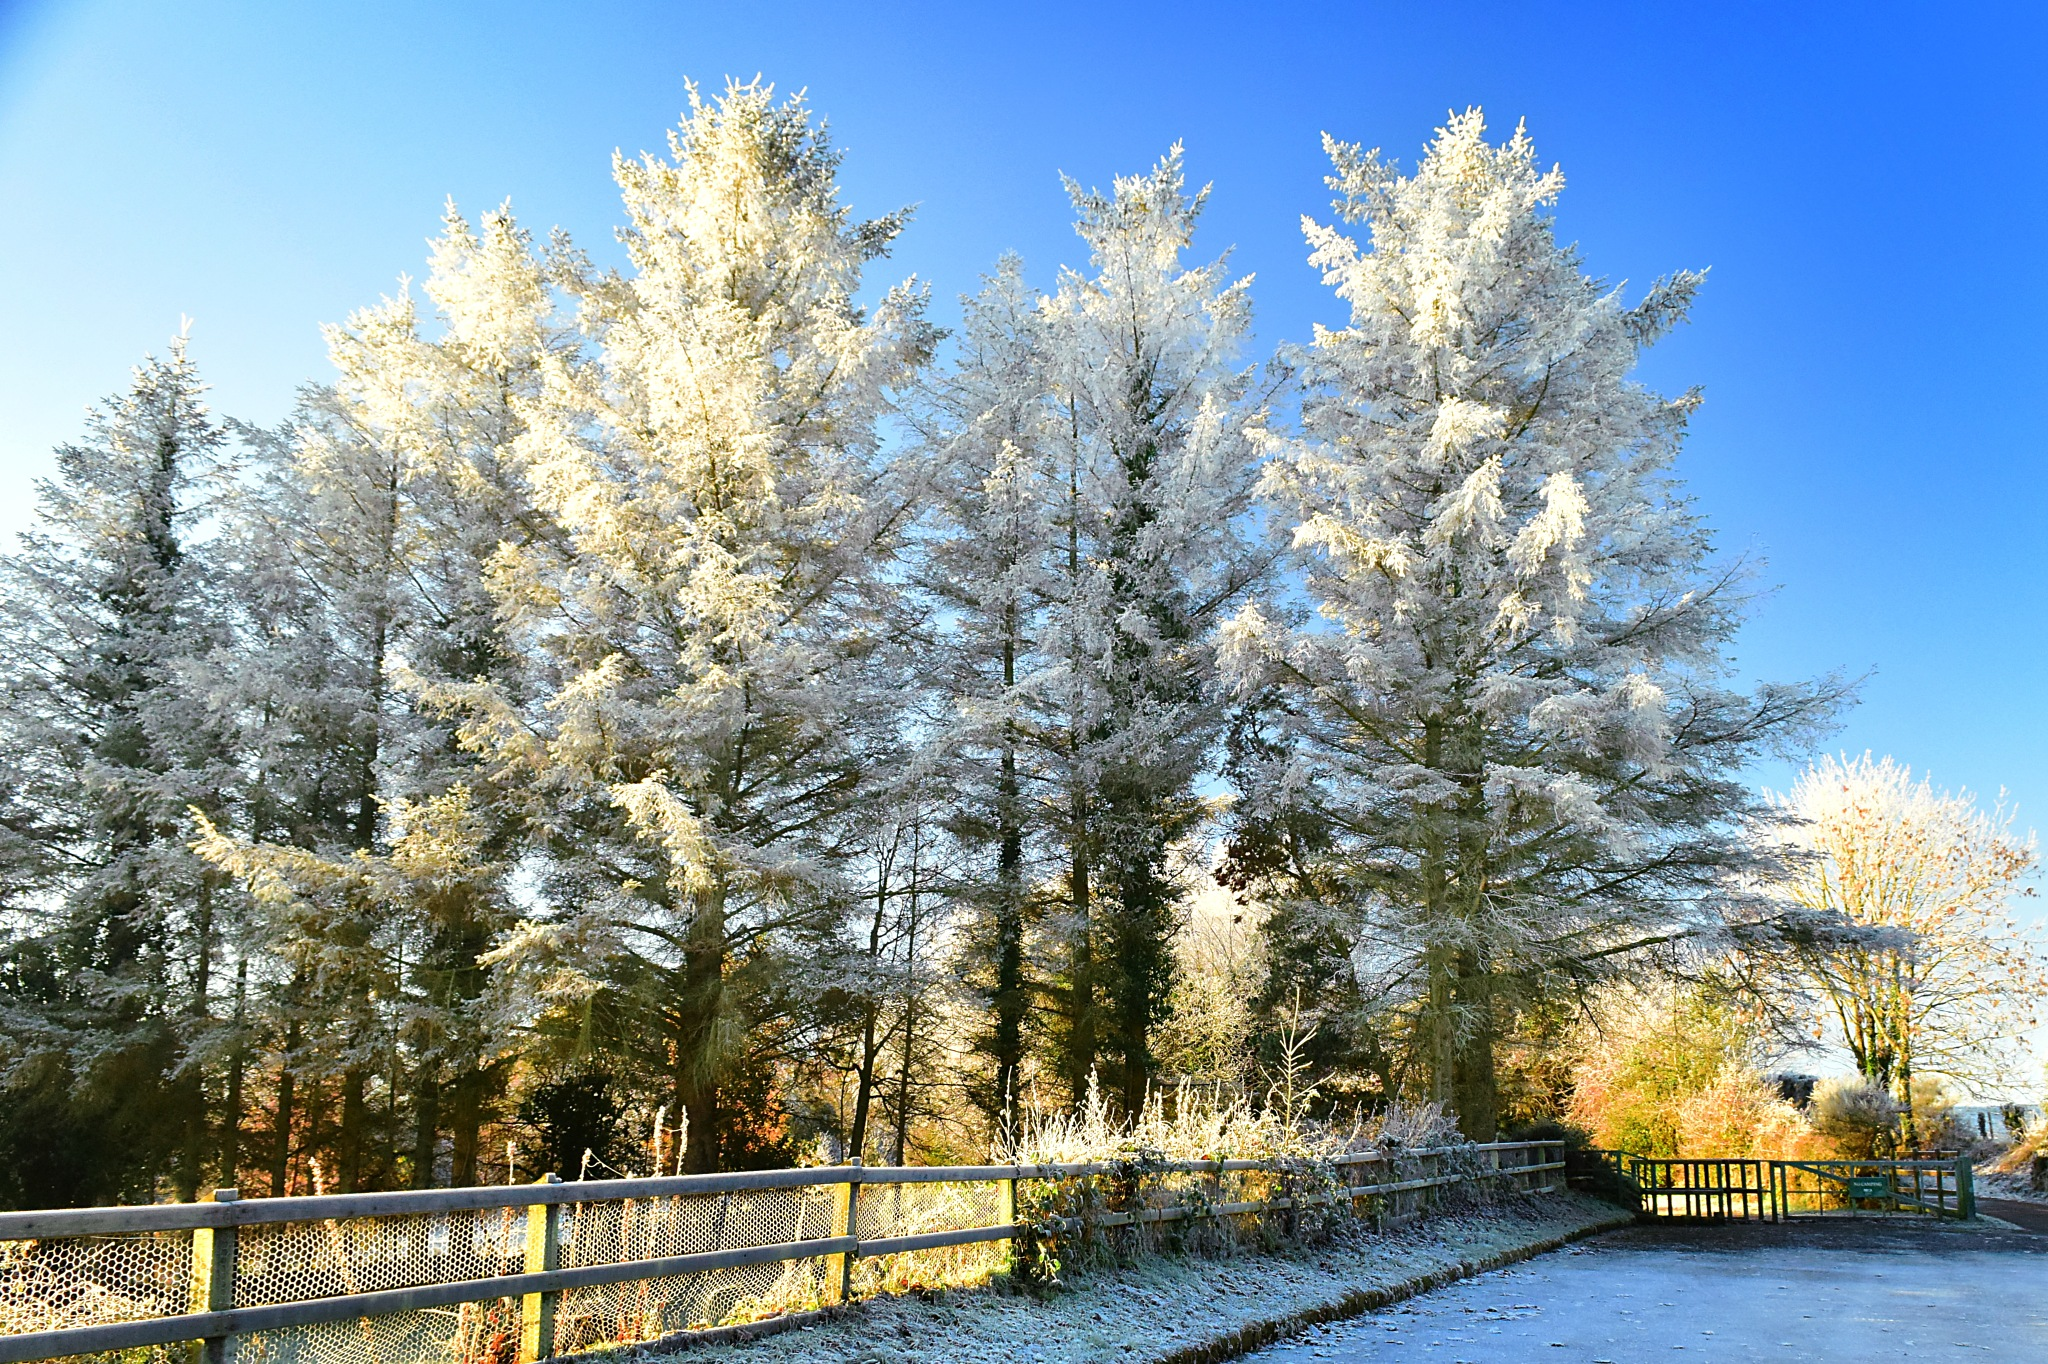 Frosty trees in low winter sun by Kenny Francis